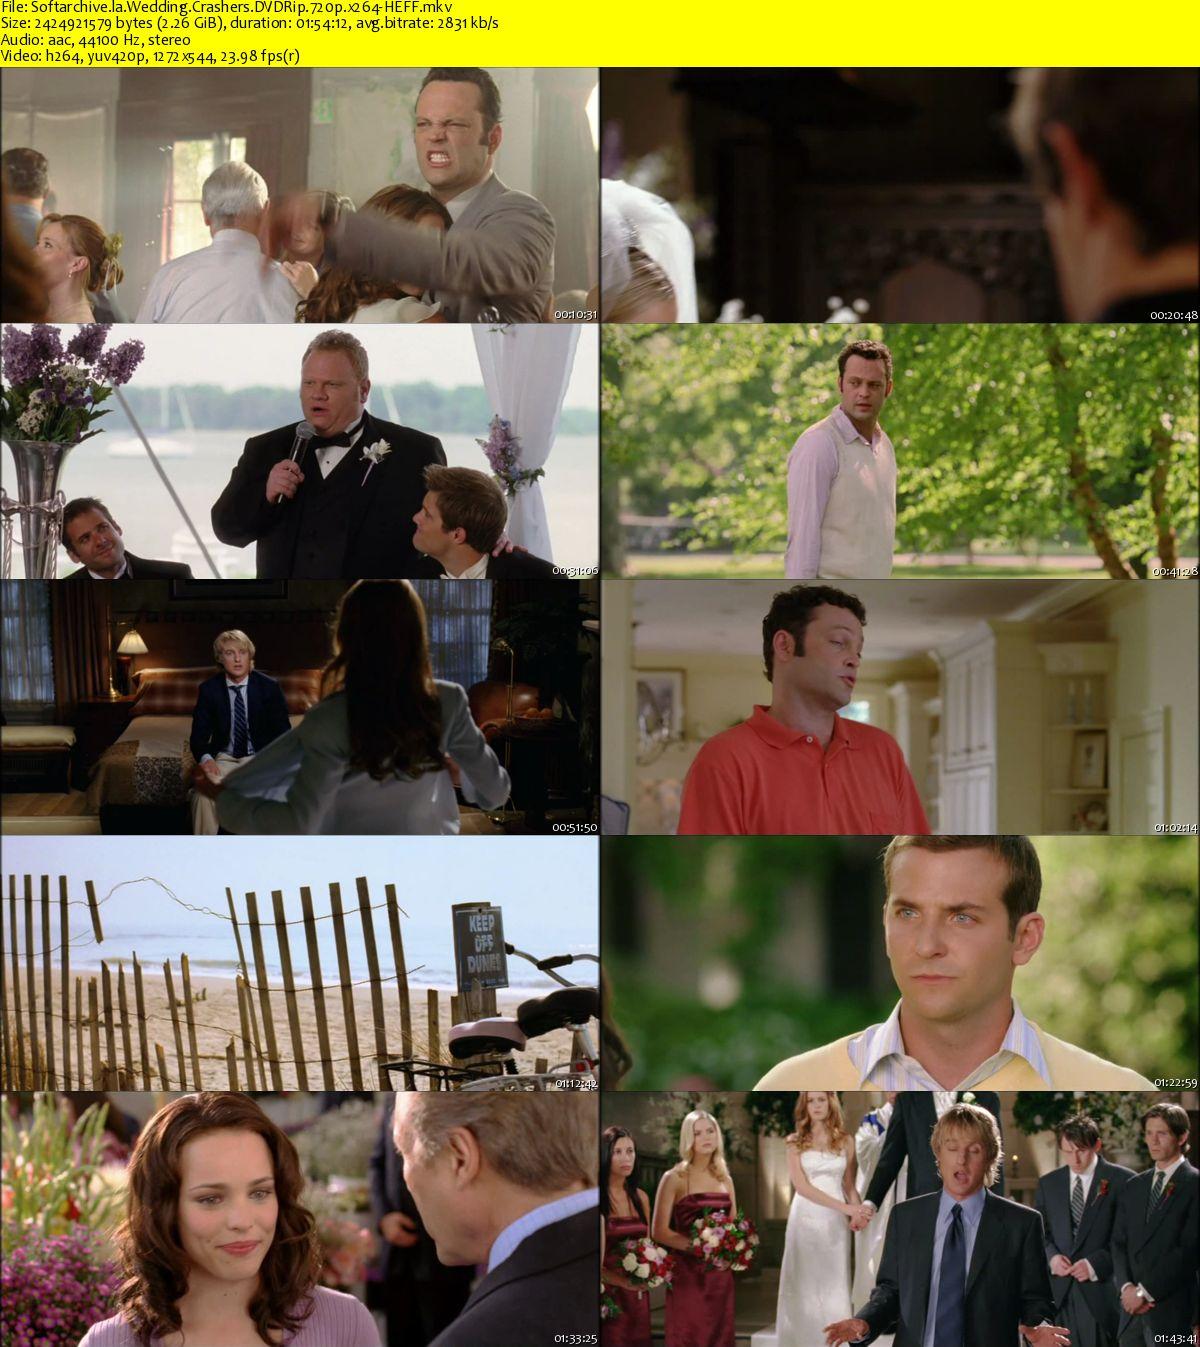 Download Wedding Crashers 2005 DVDRip 720p X264-HEFF